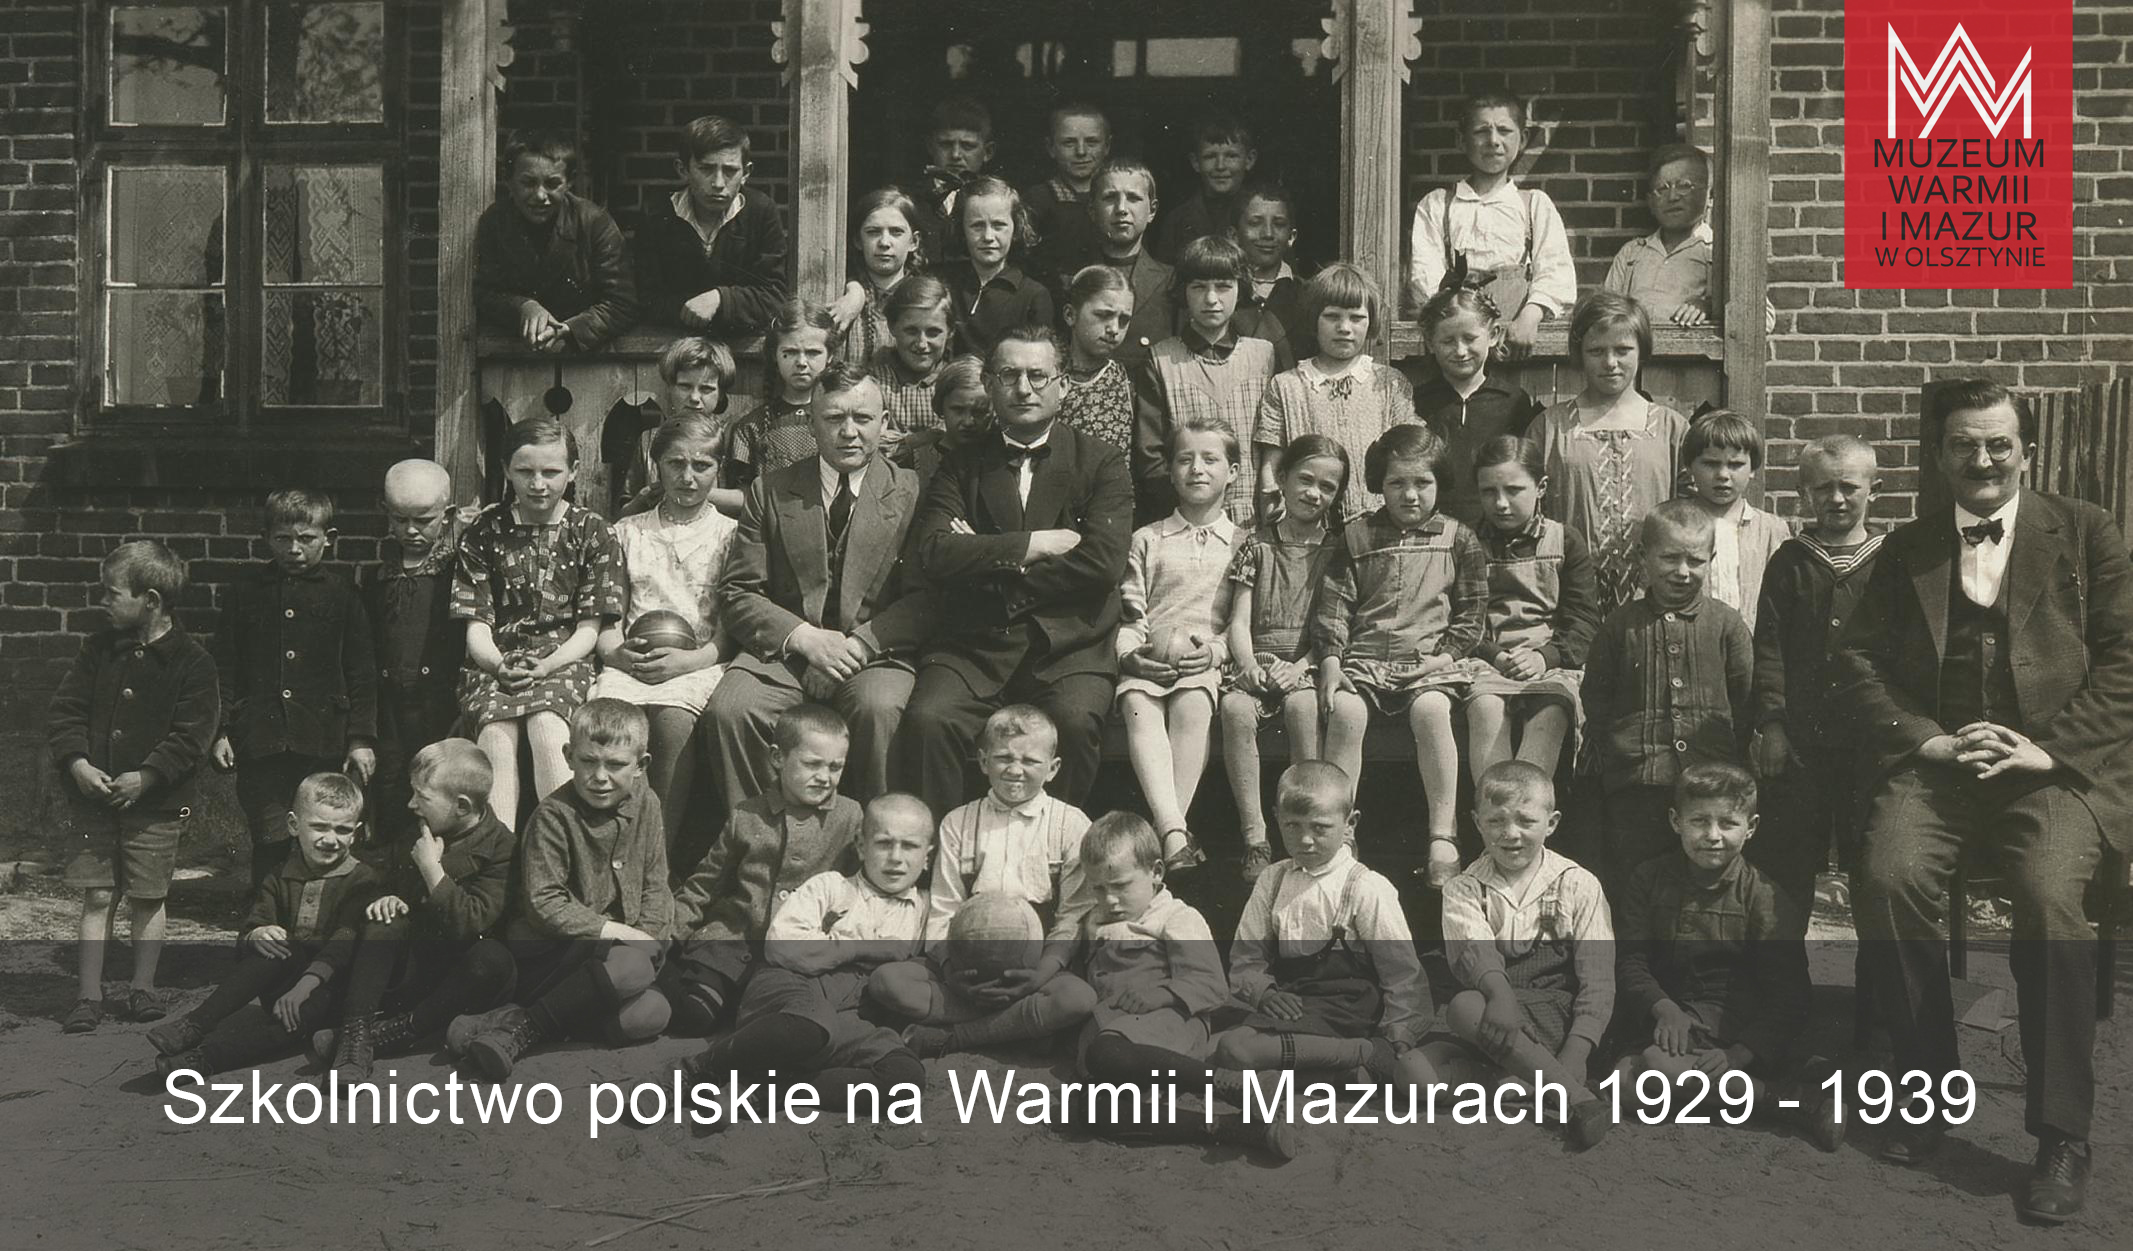 http://m.wmwm.pl/2019/09/orig/szkolnictwo-6476.jpg